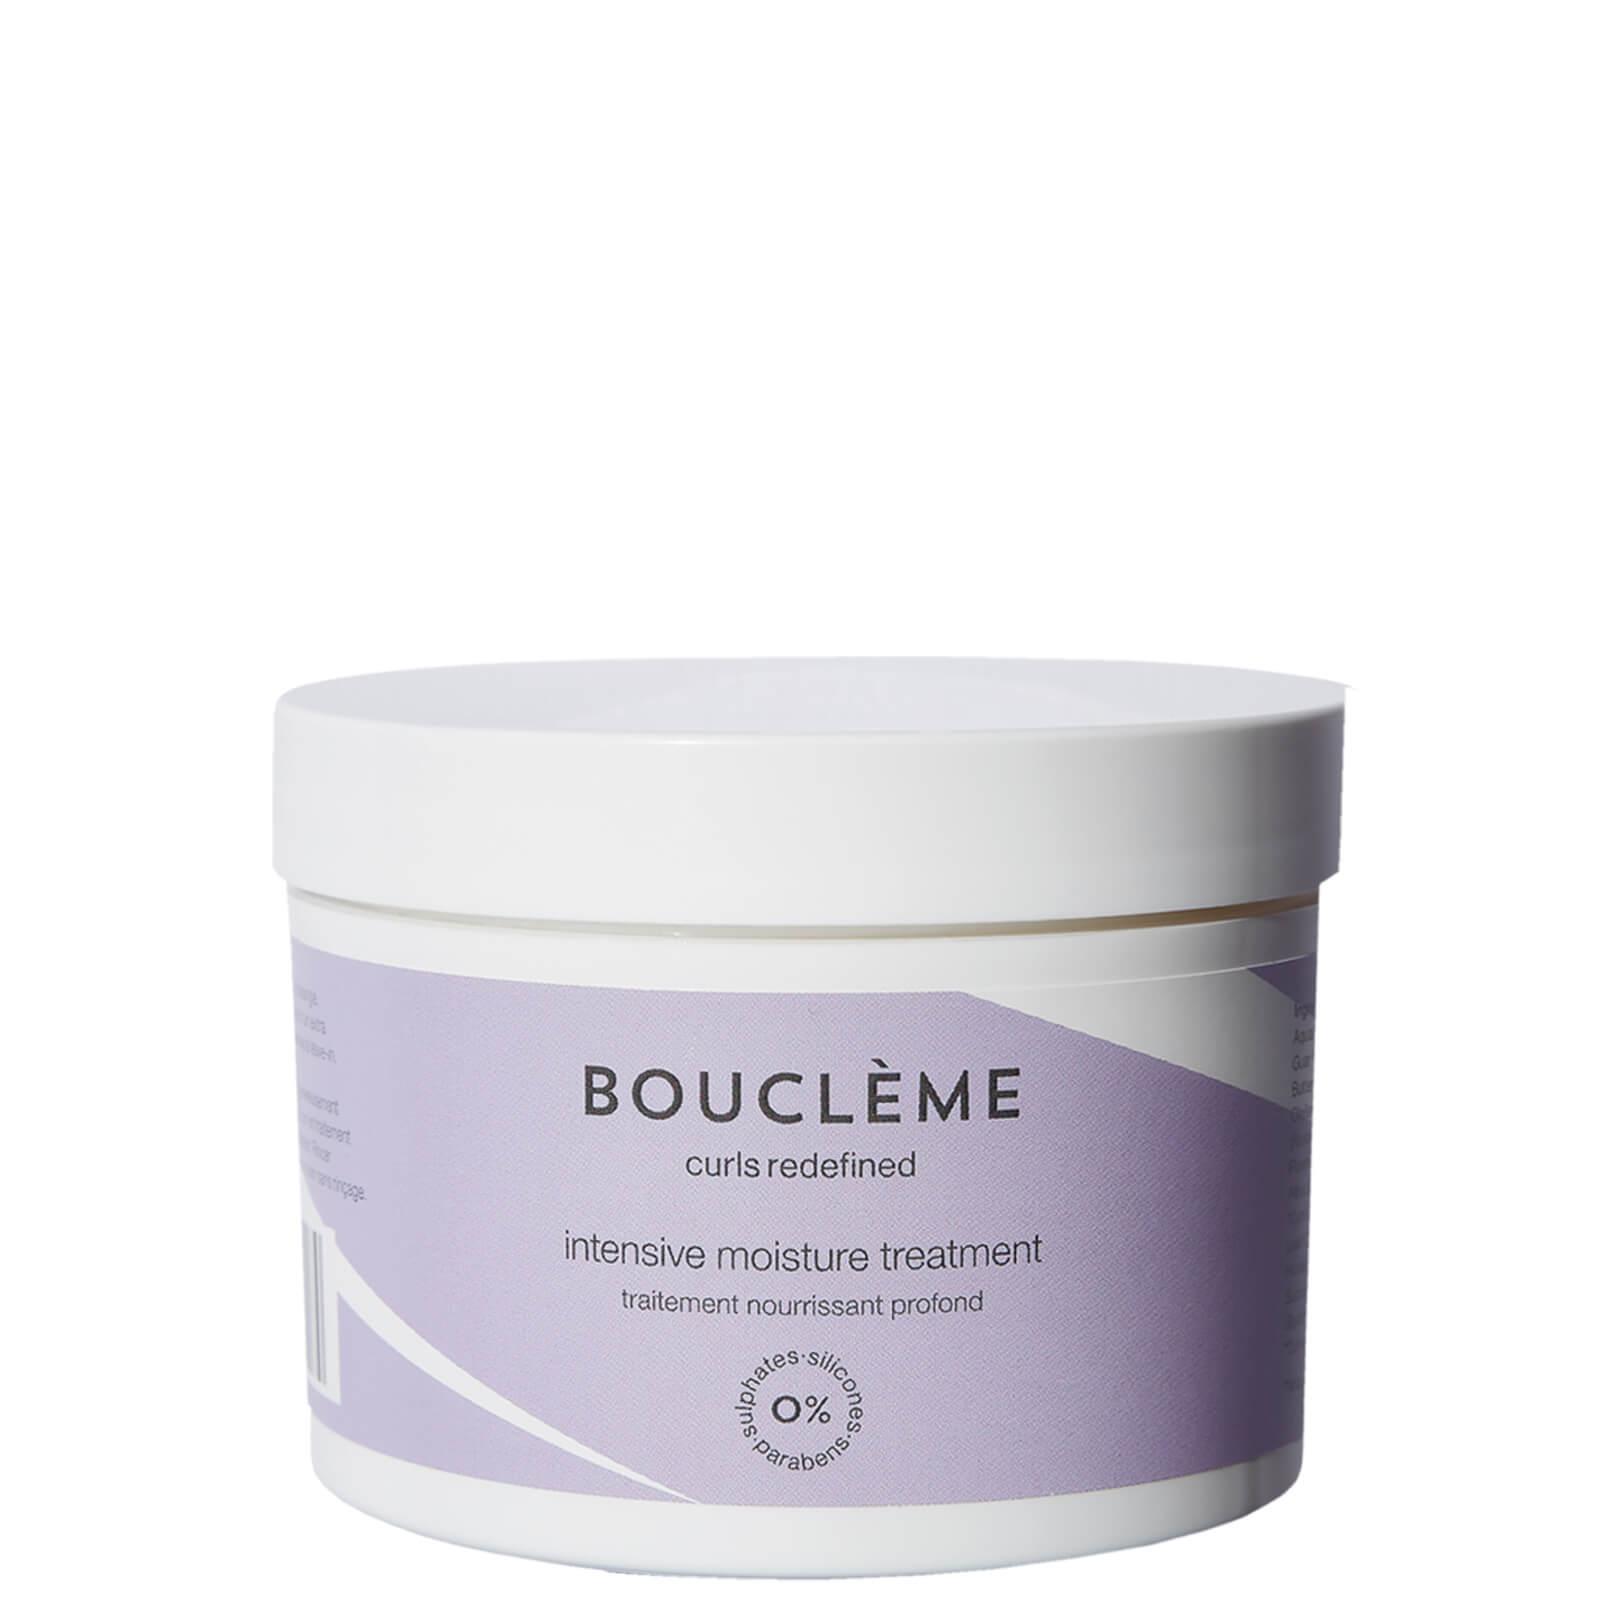 Купить Bouclème Intensive Moisture Treatment 250ml